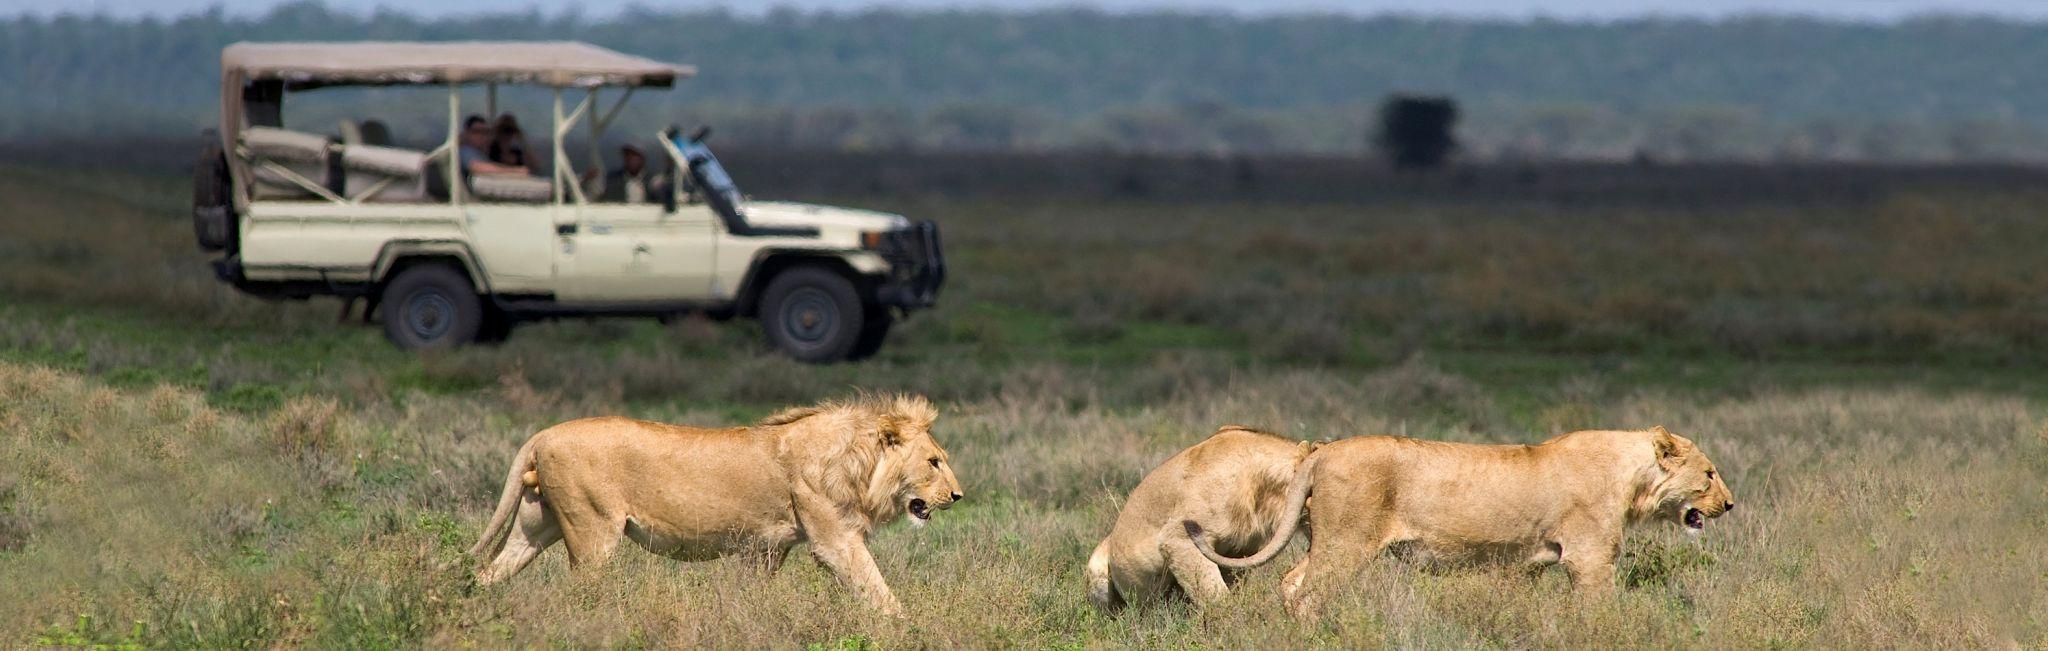 Safari Tour Guide Salary